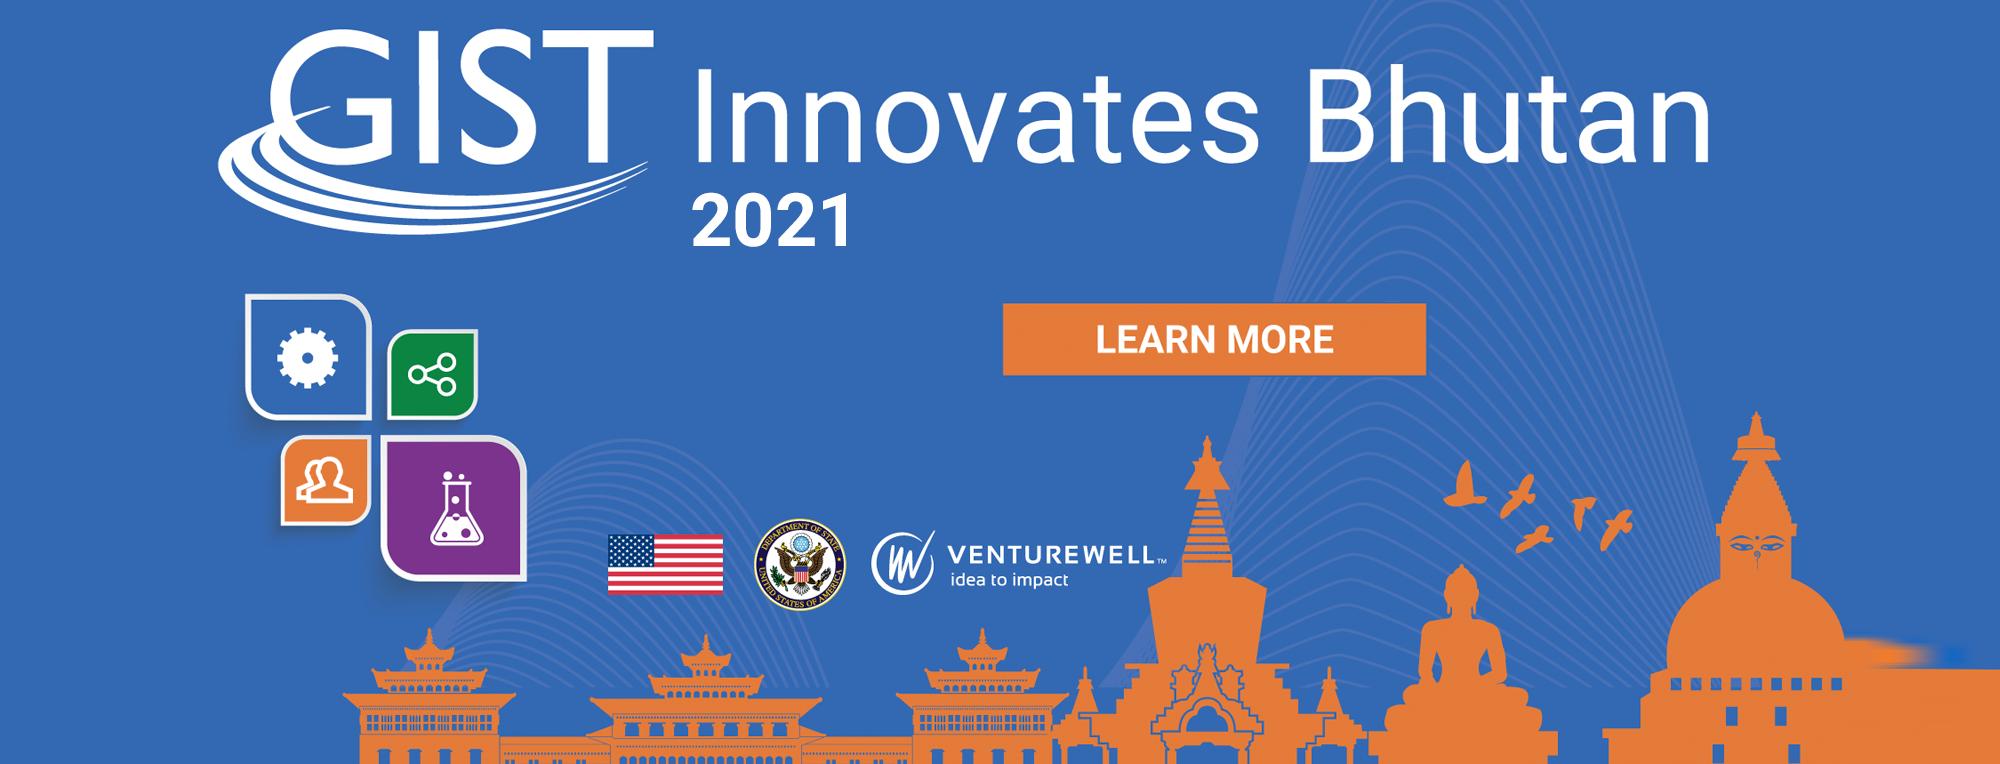 Apply now for GIST Innovates Bhutan!